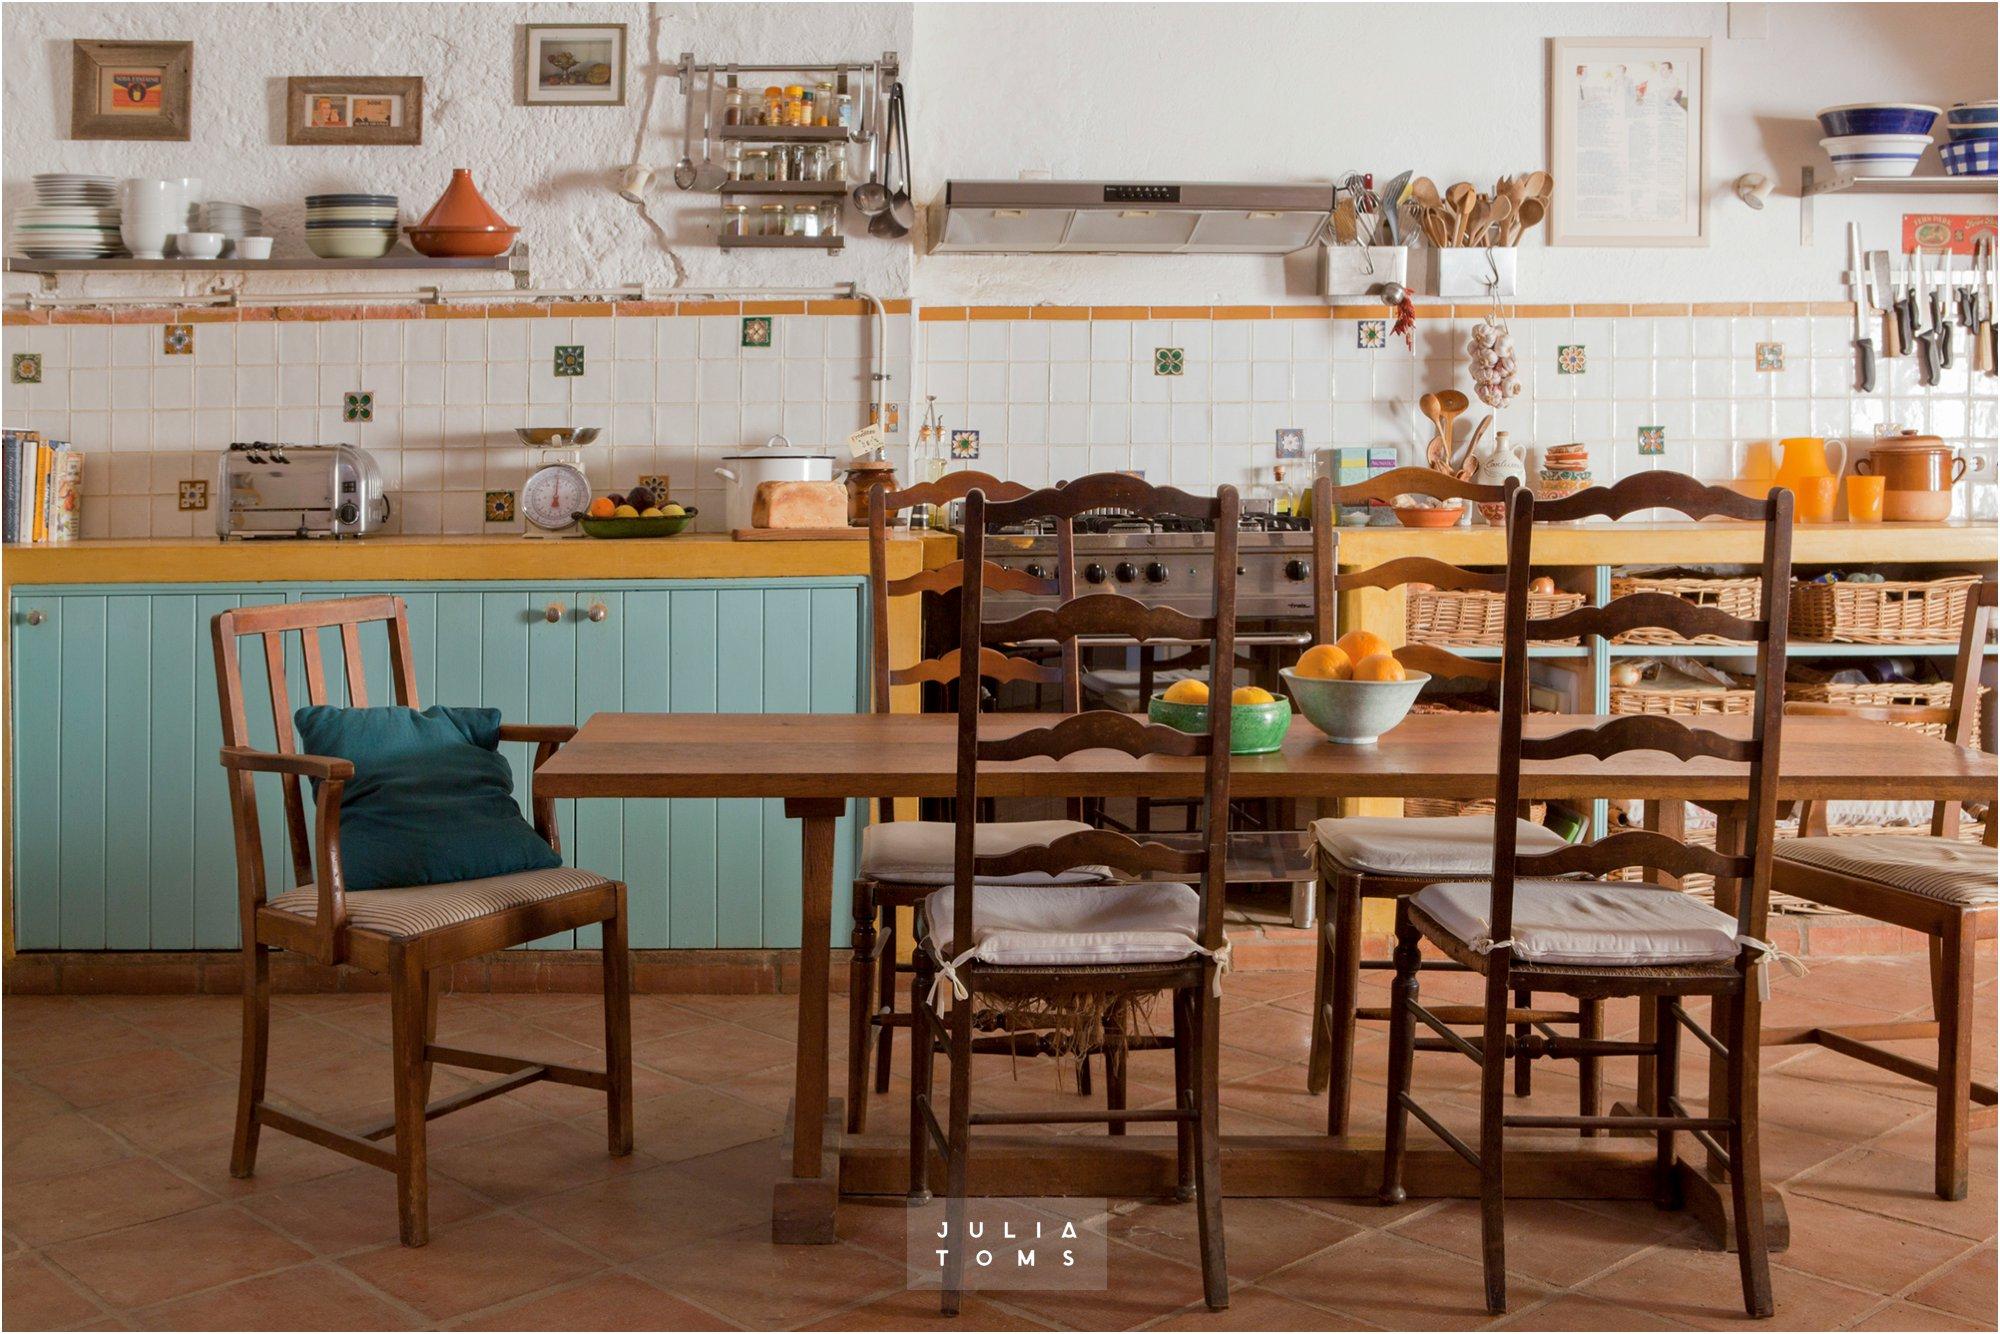 julia_toms_photography_interiors_magazine_007.jpg